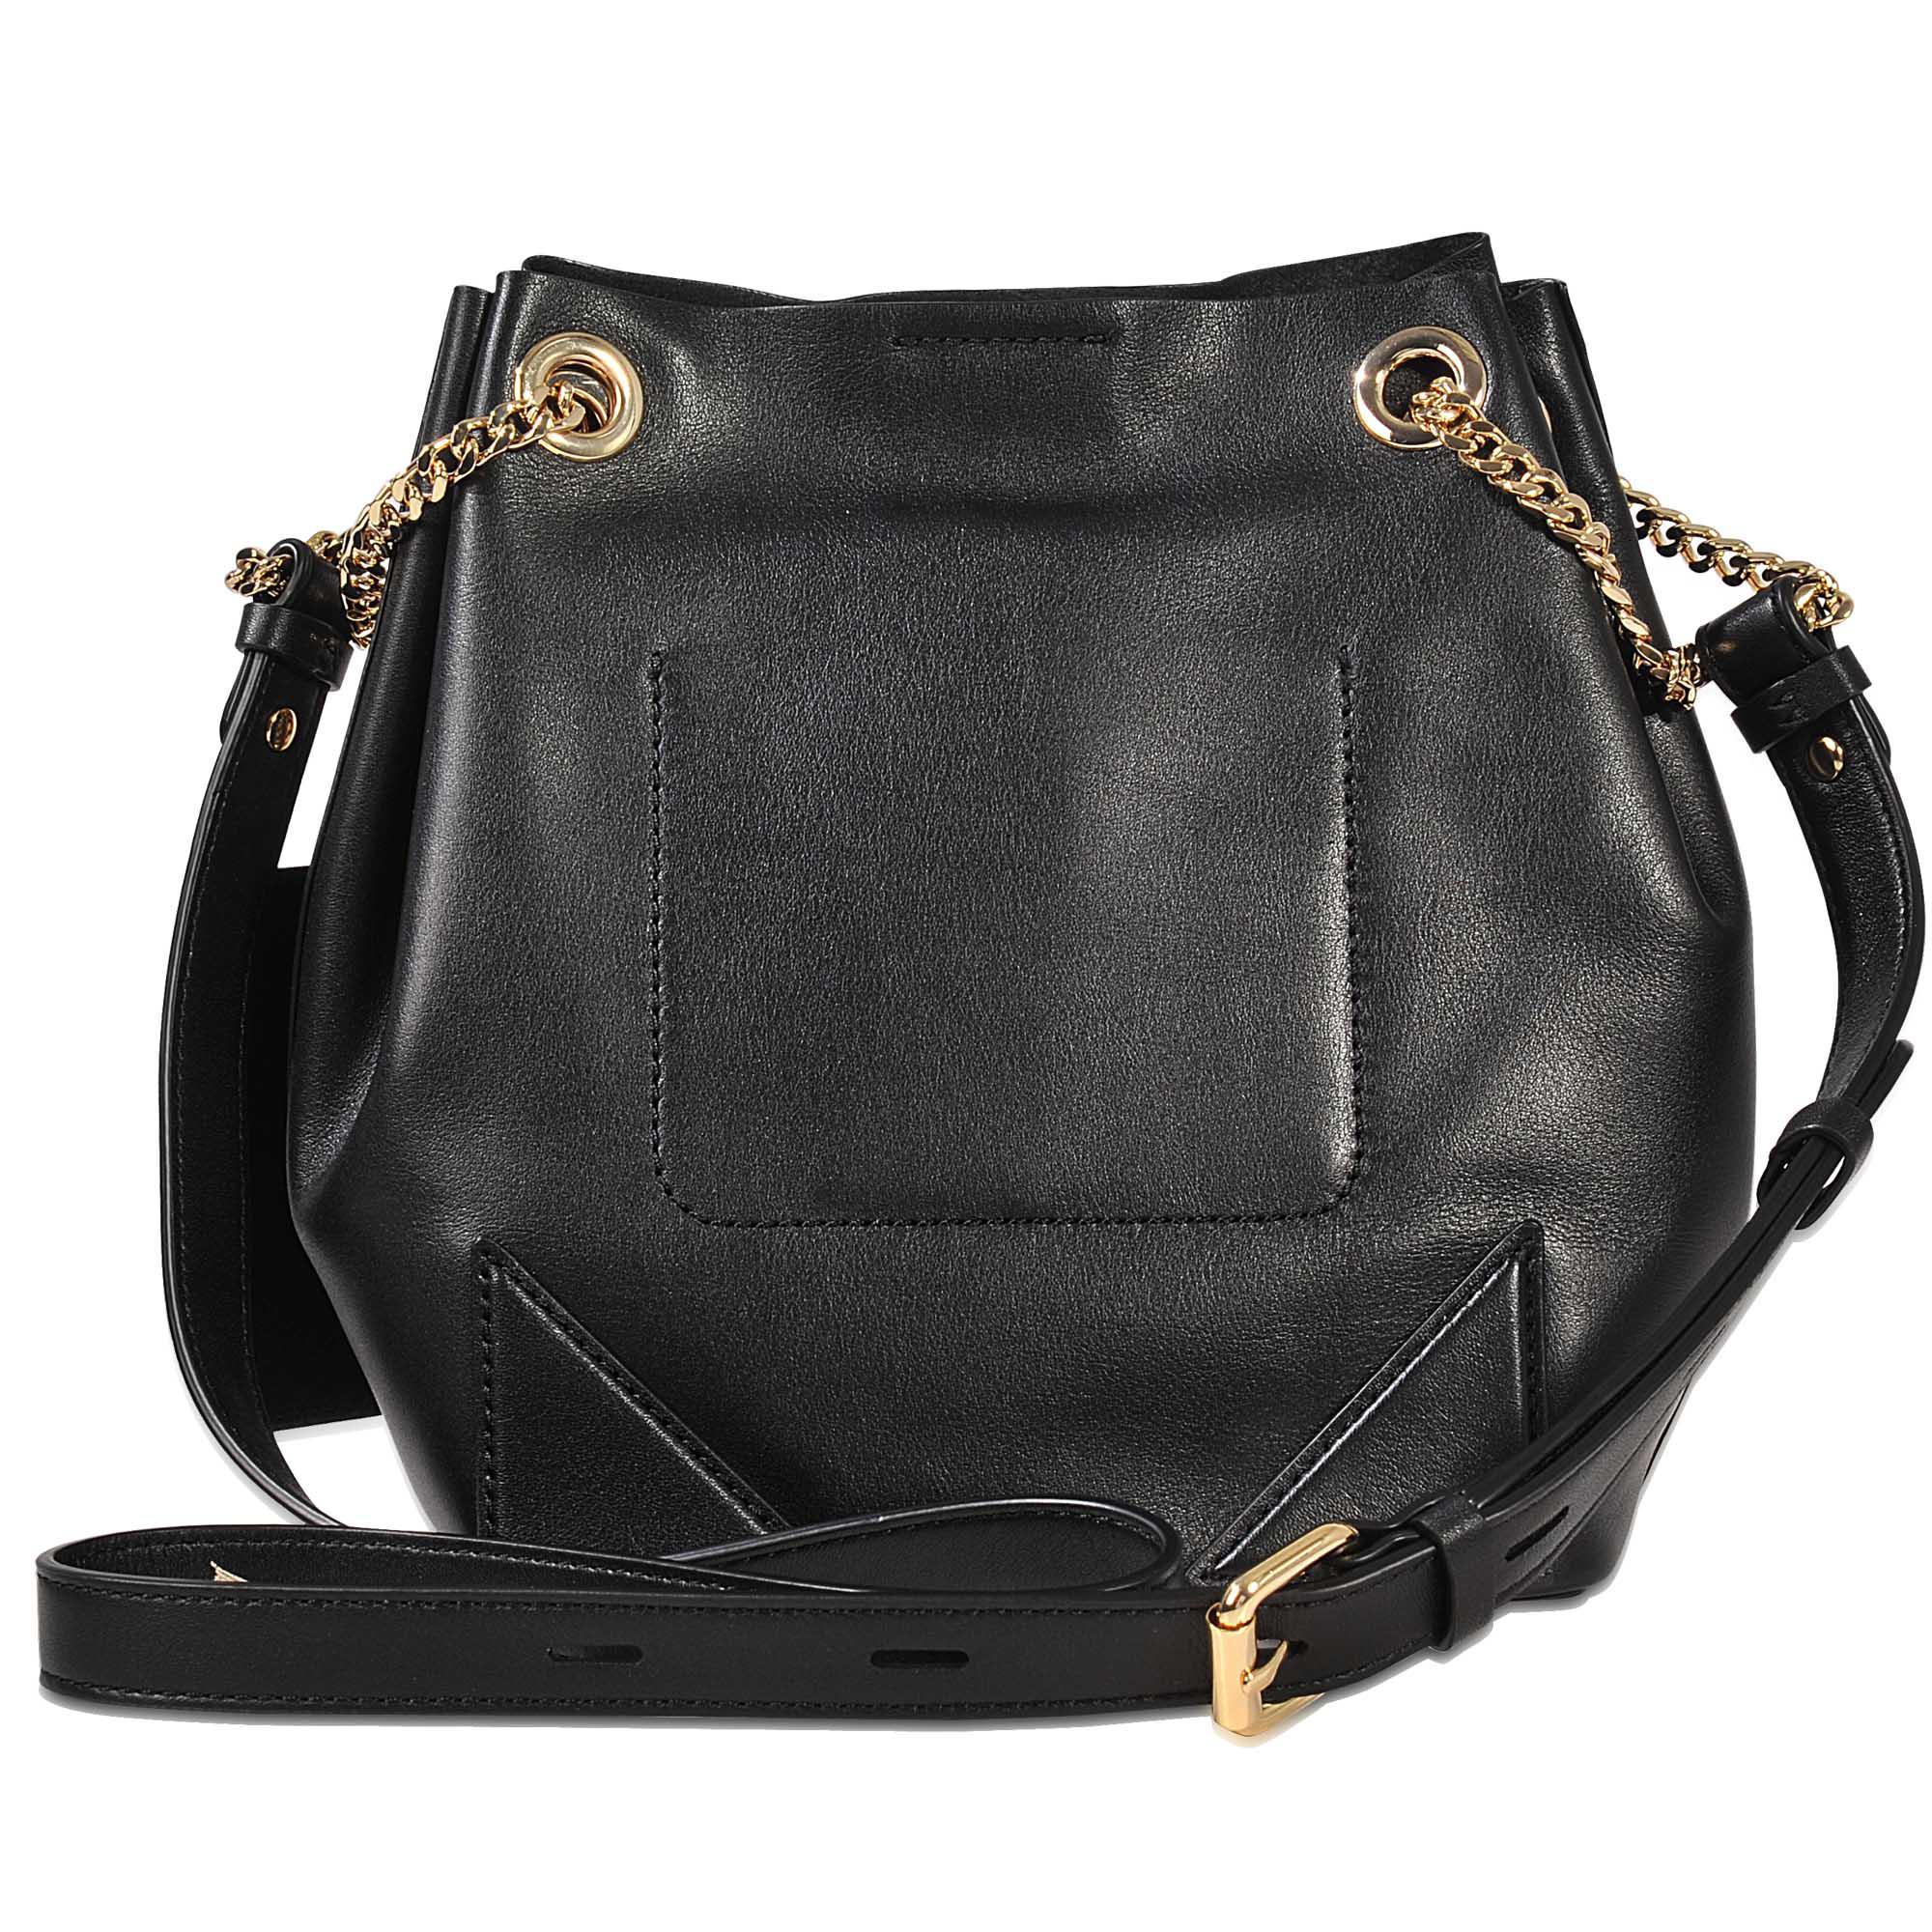 5169b17f68 Lyst - Karl Lagerfeld K Slouchy Drawstring Bag in Black